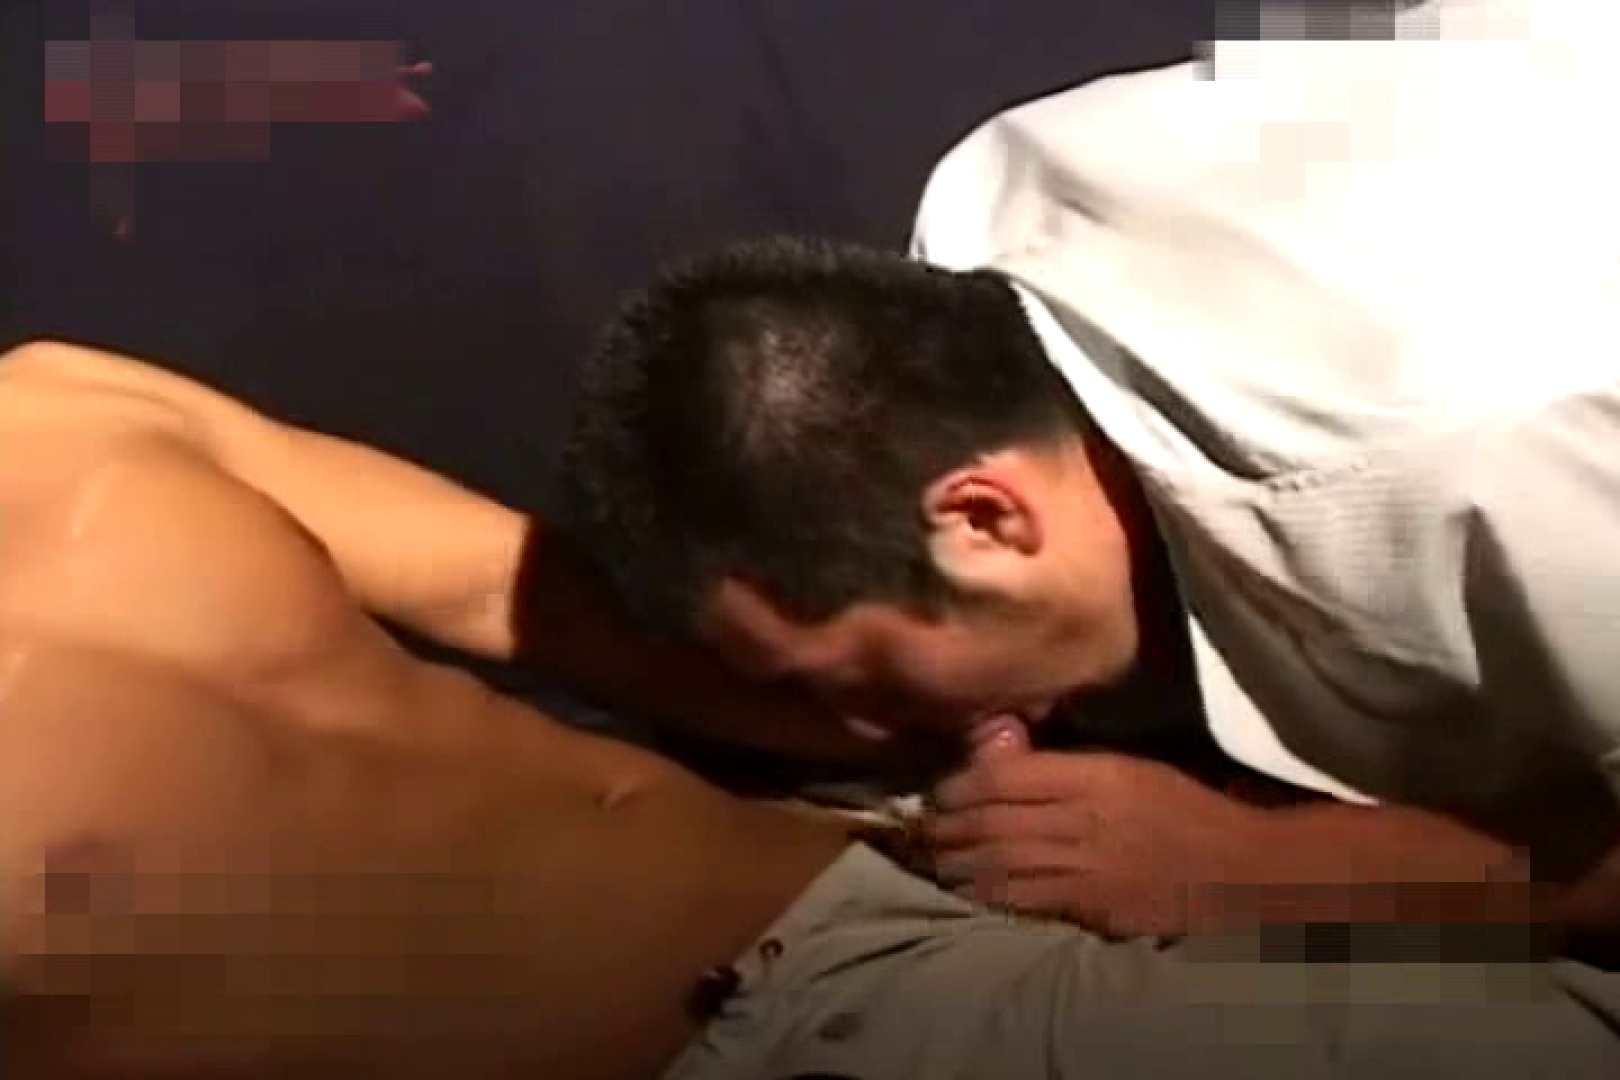 Beautiful muscle モッコリ野郎達!Vol.05 念願の完全無修正 ゲイ射精画像 50連発 23